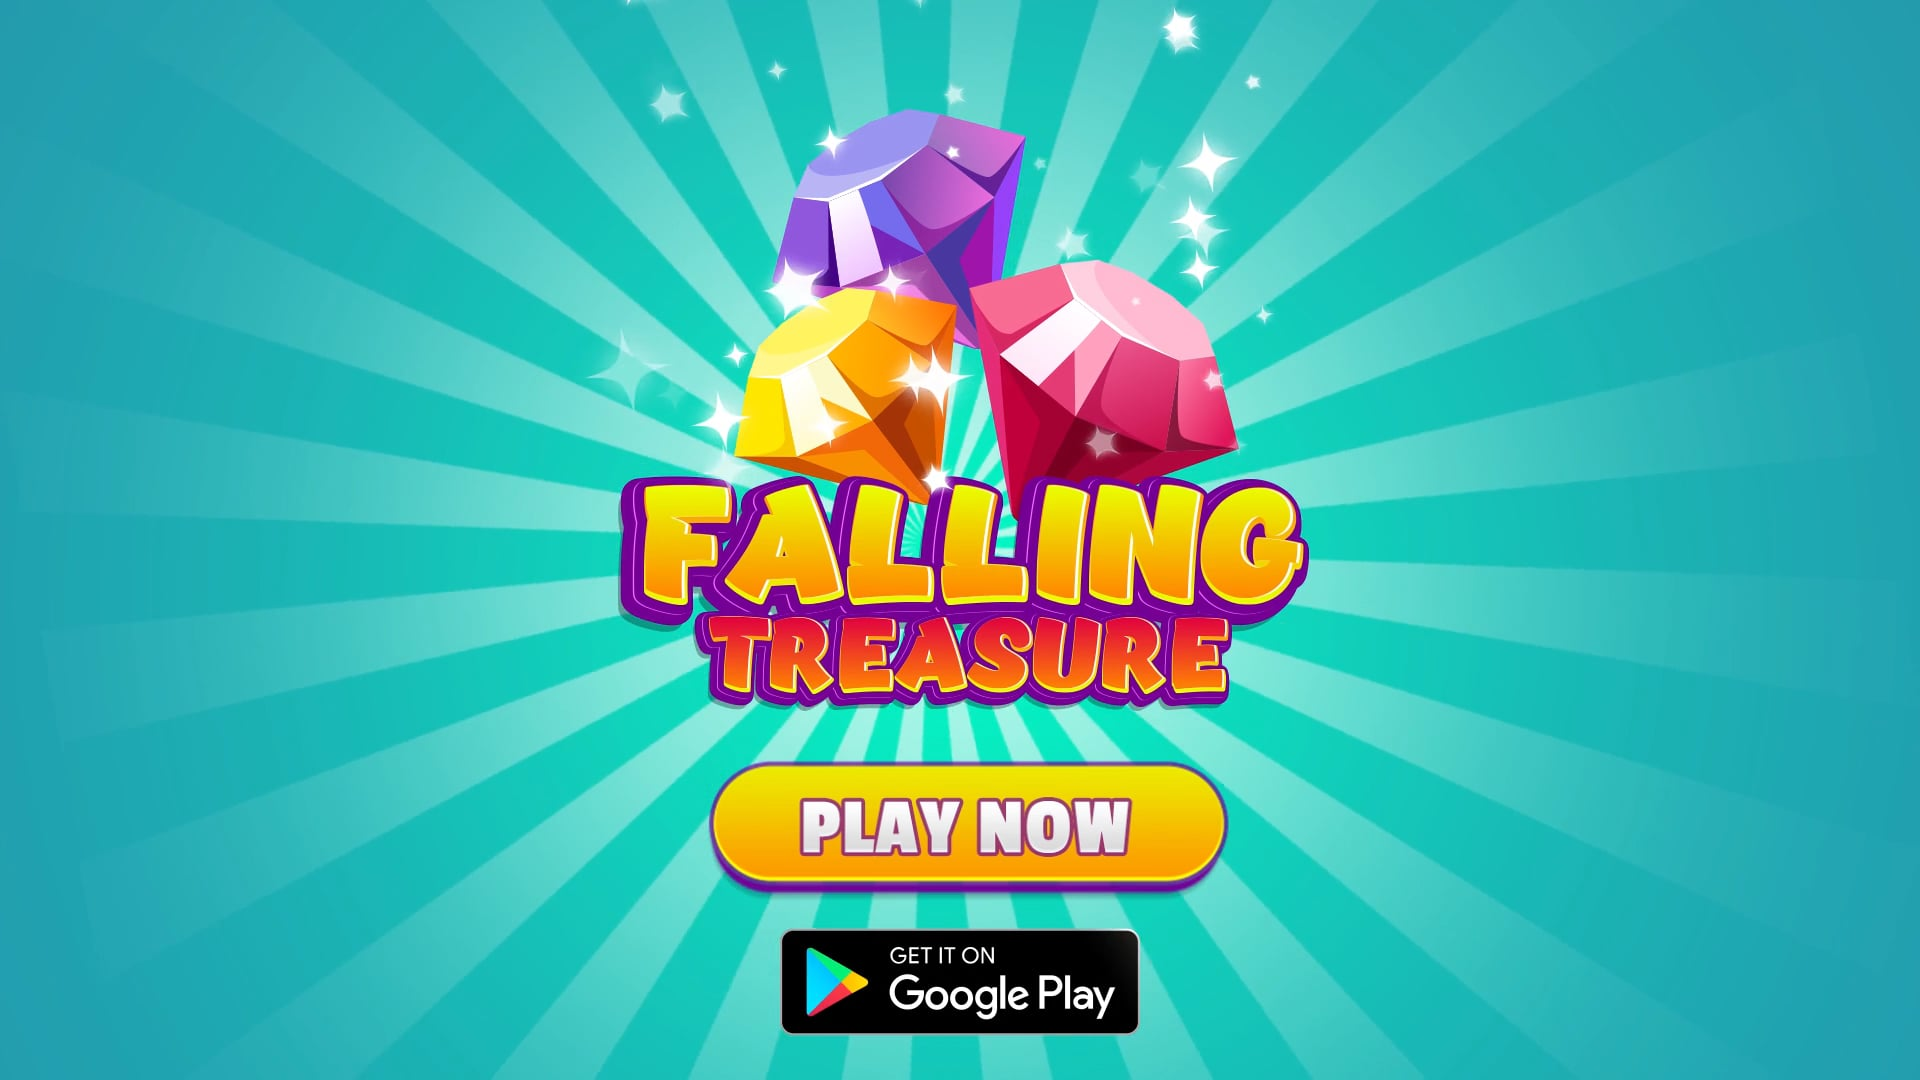 Falling Treasure